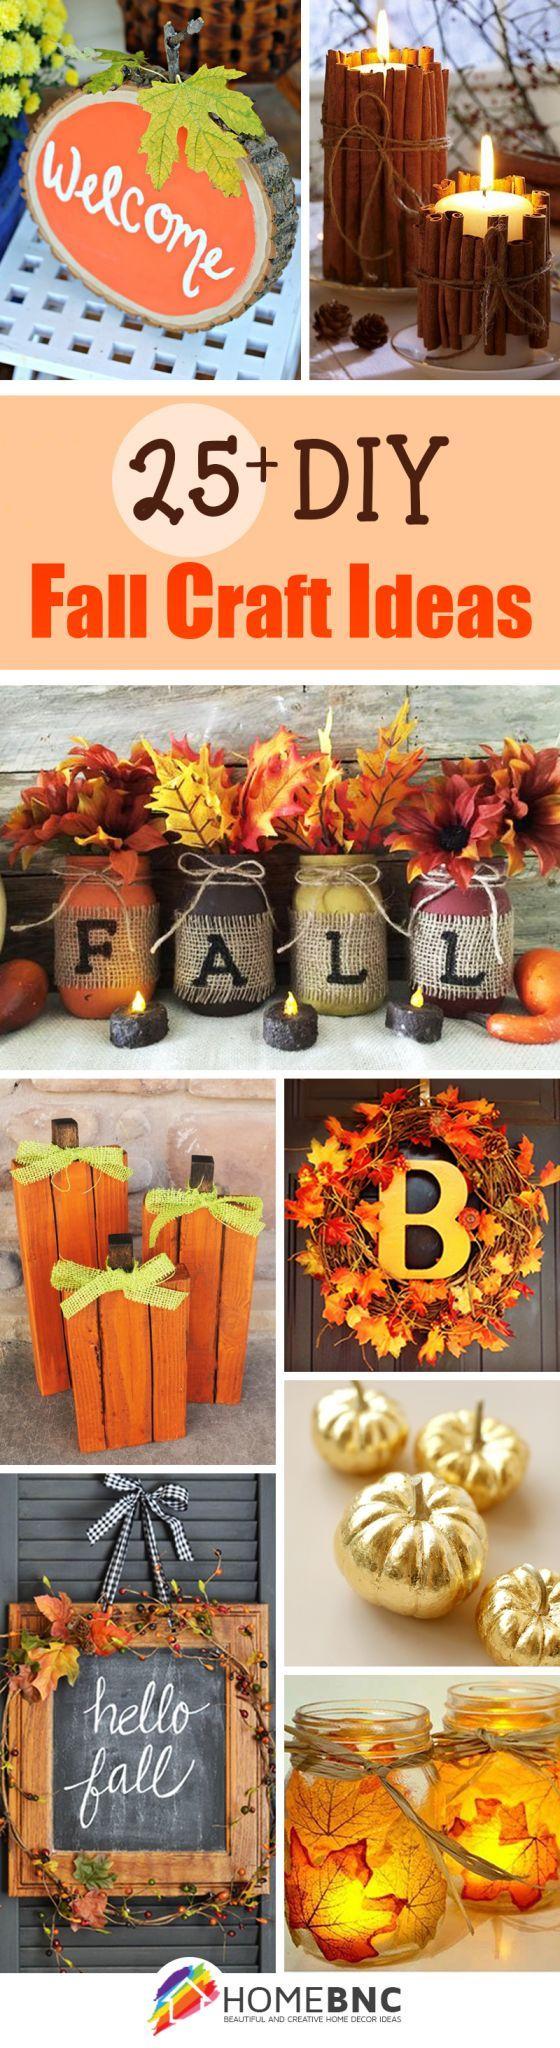 DIY Fall Craft Decorations